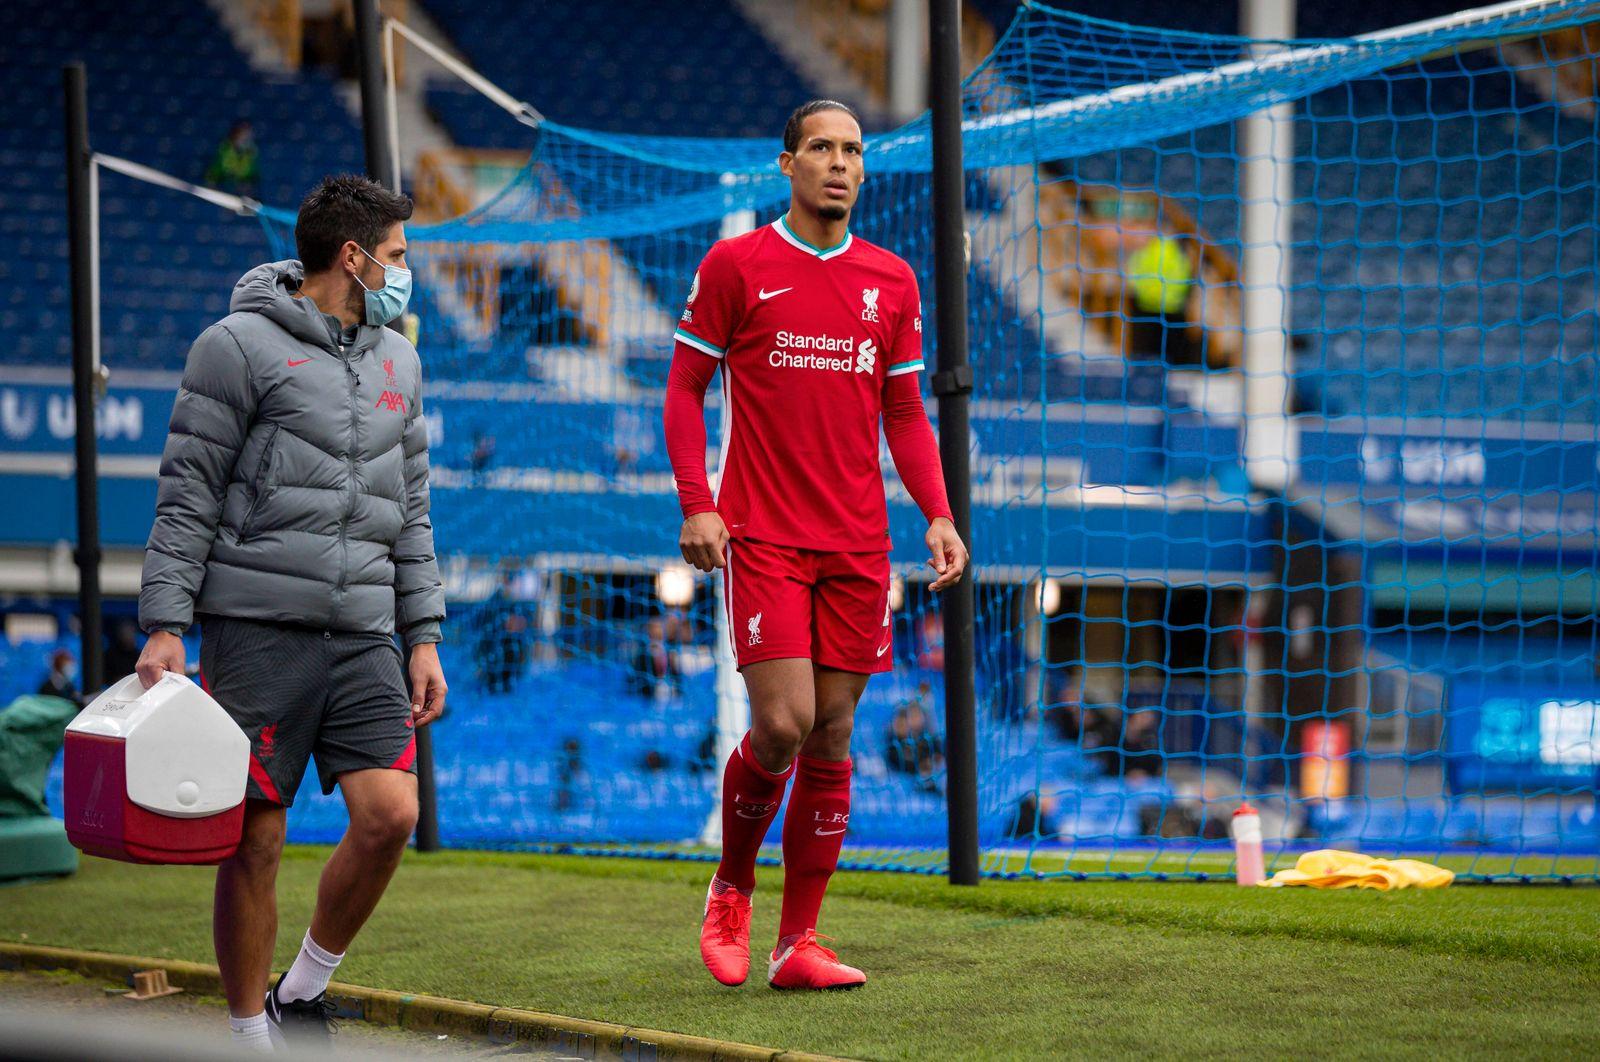 (201018) -- LIVERPOOL, Oct. 18, 2020 -- Liverpool s Virgil van Dijk (R) limps off injured during the Premier League matc